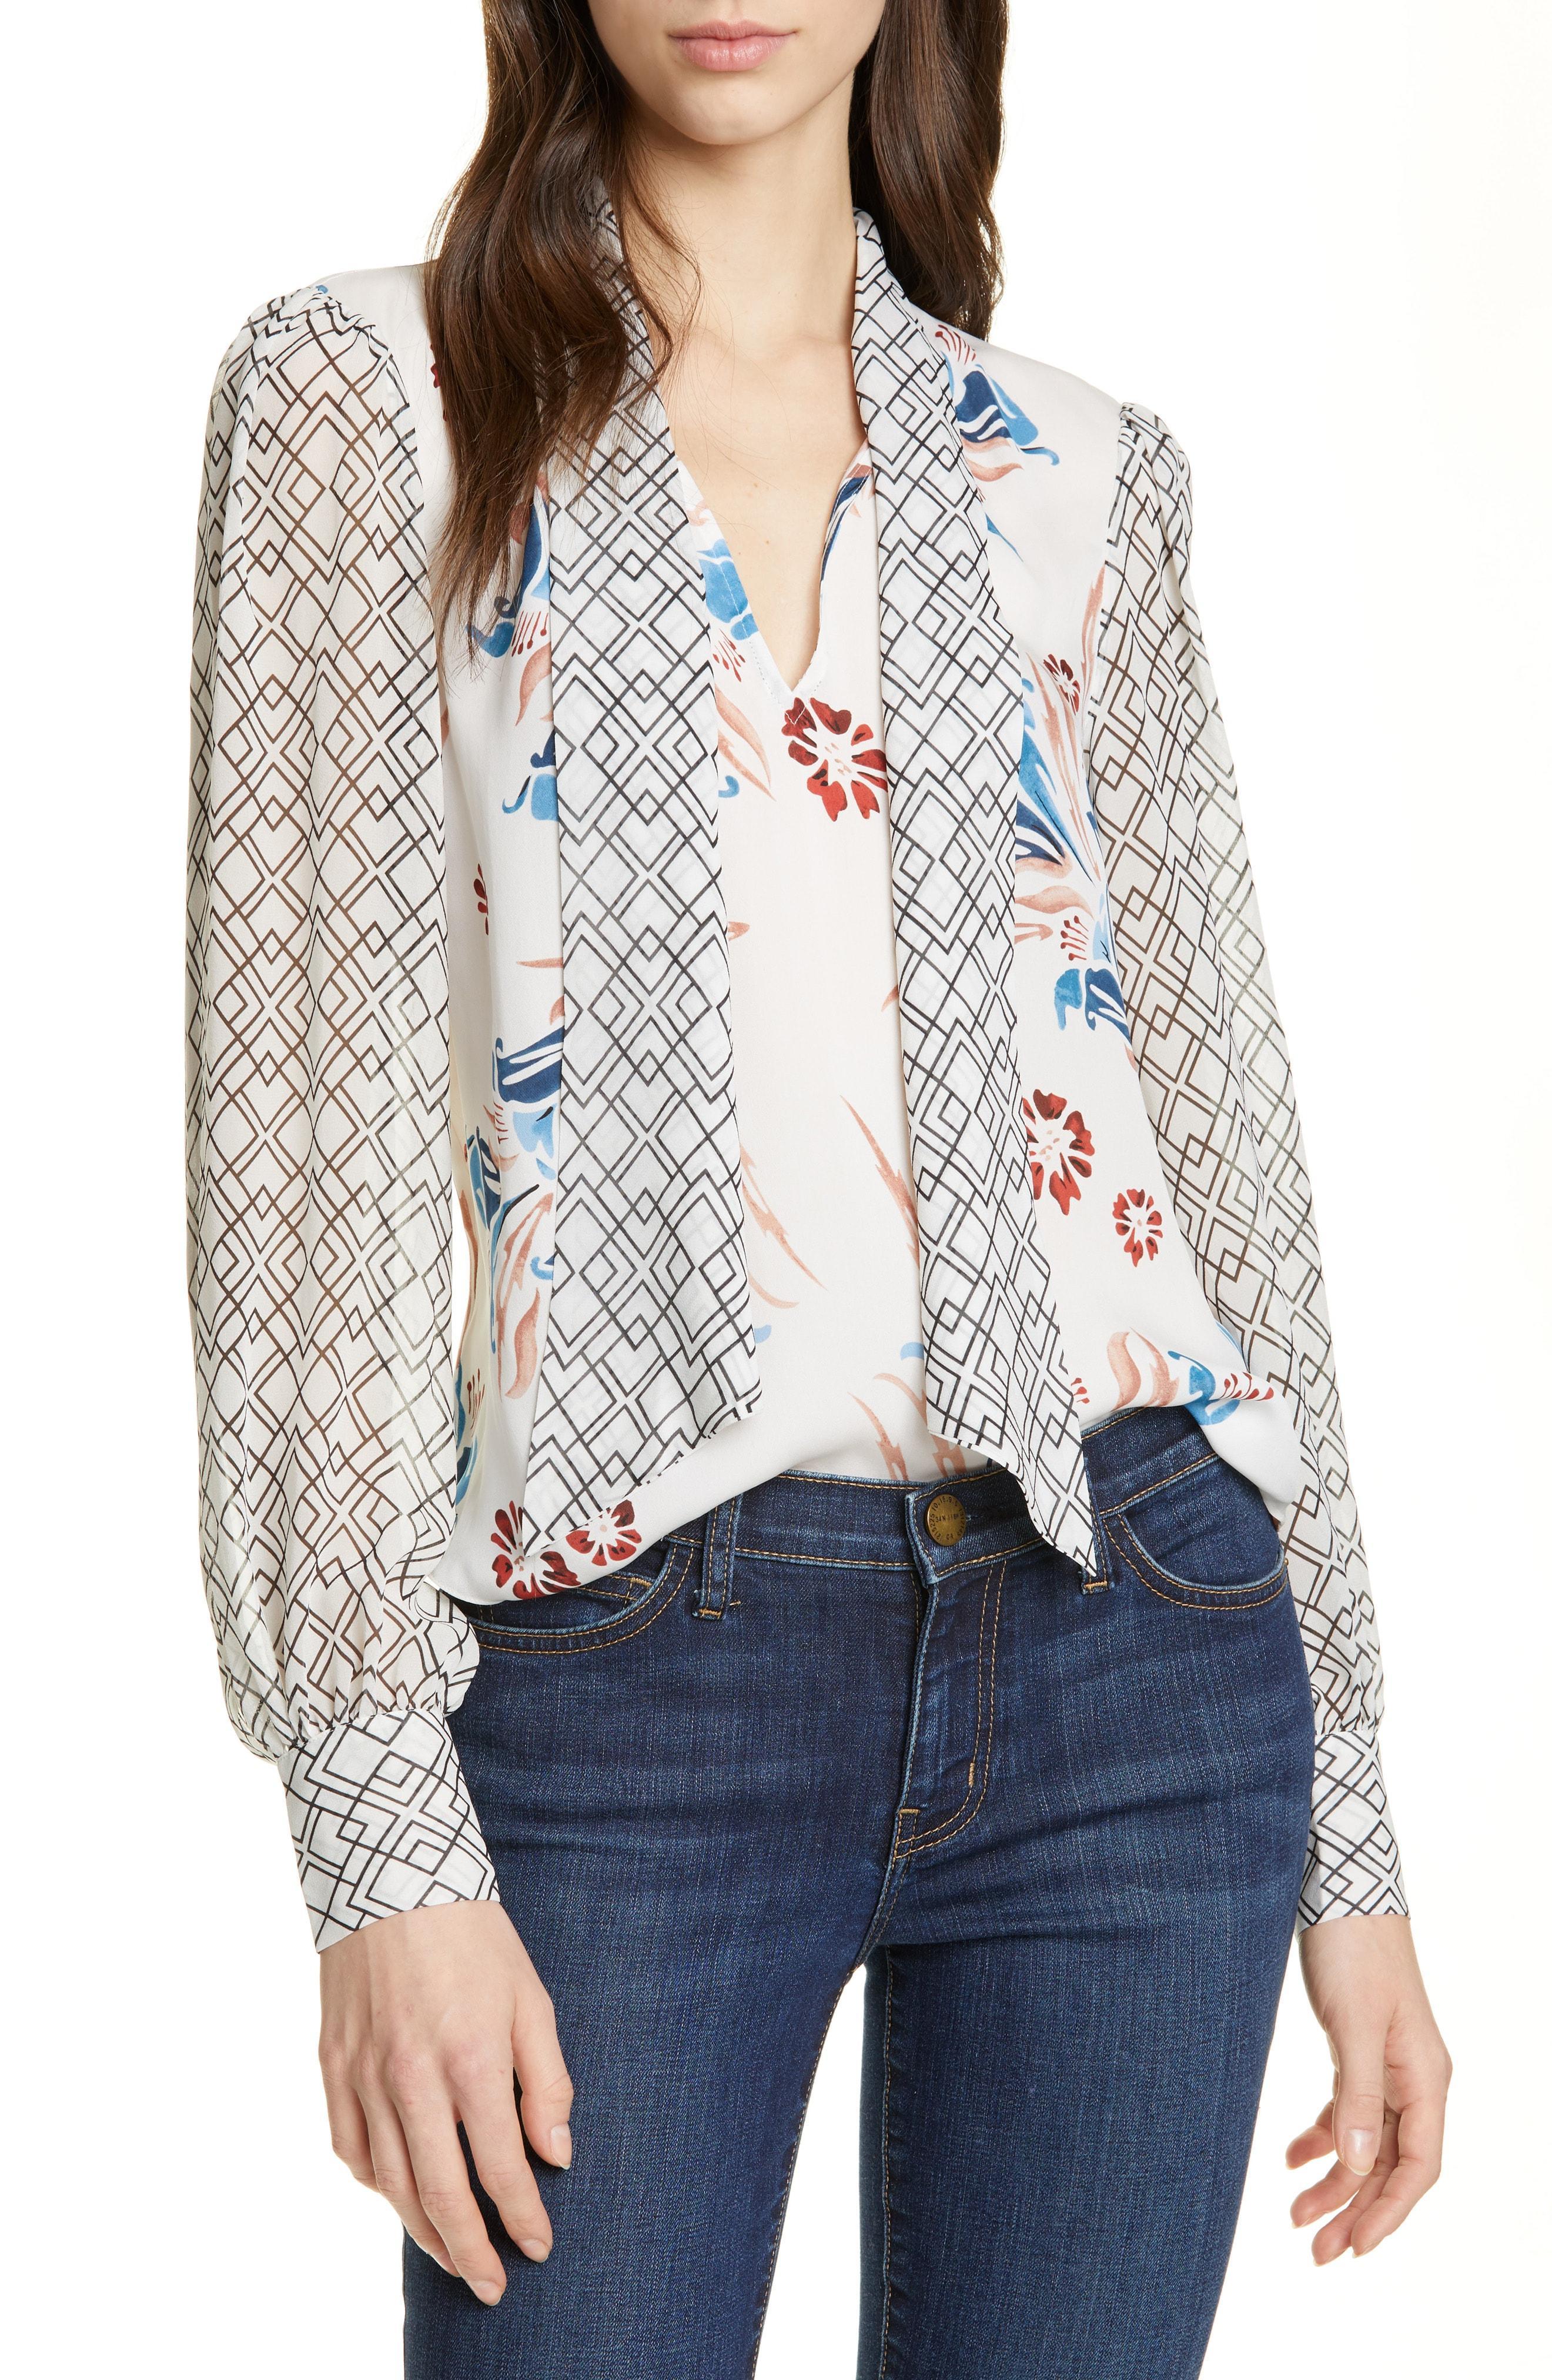 443930a5970b8 Joie. Women s Kanela Mixed Print Tie Neck Silk Blouse